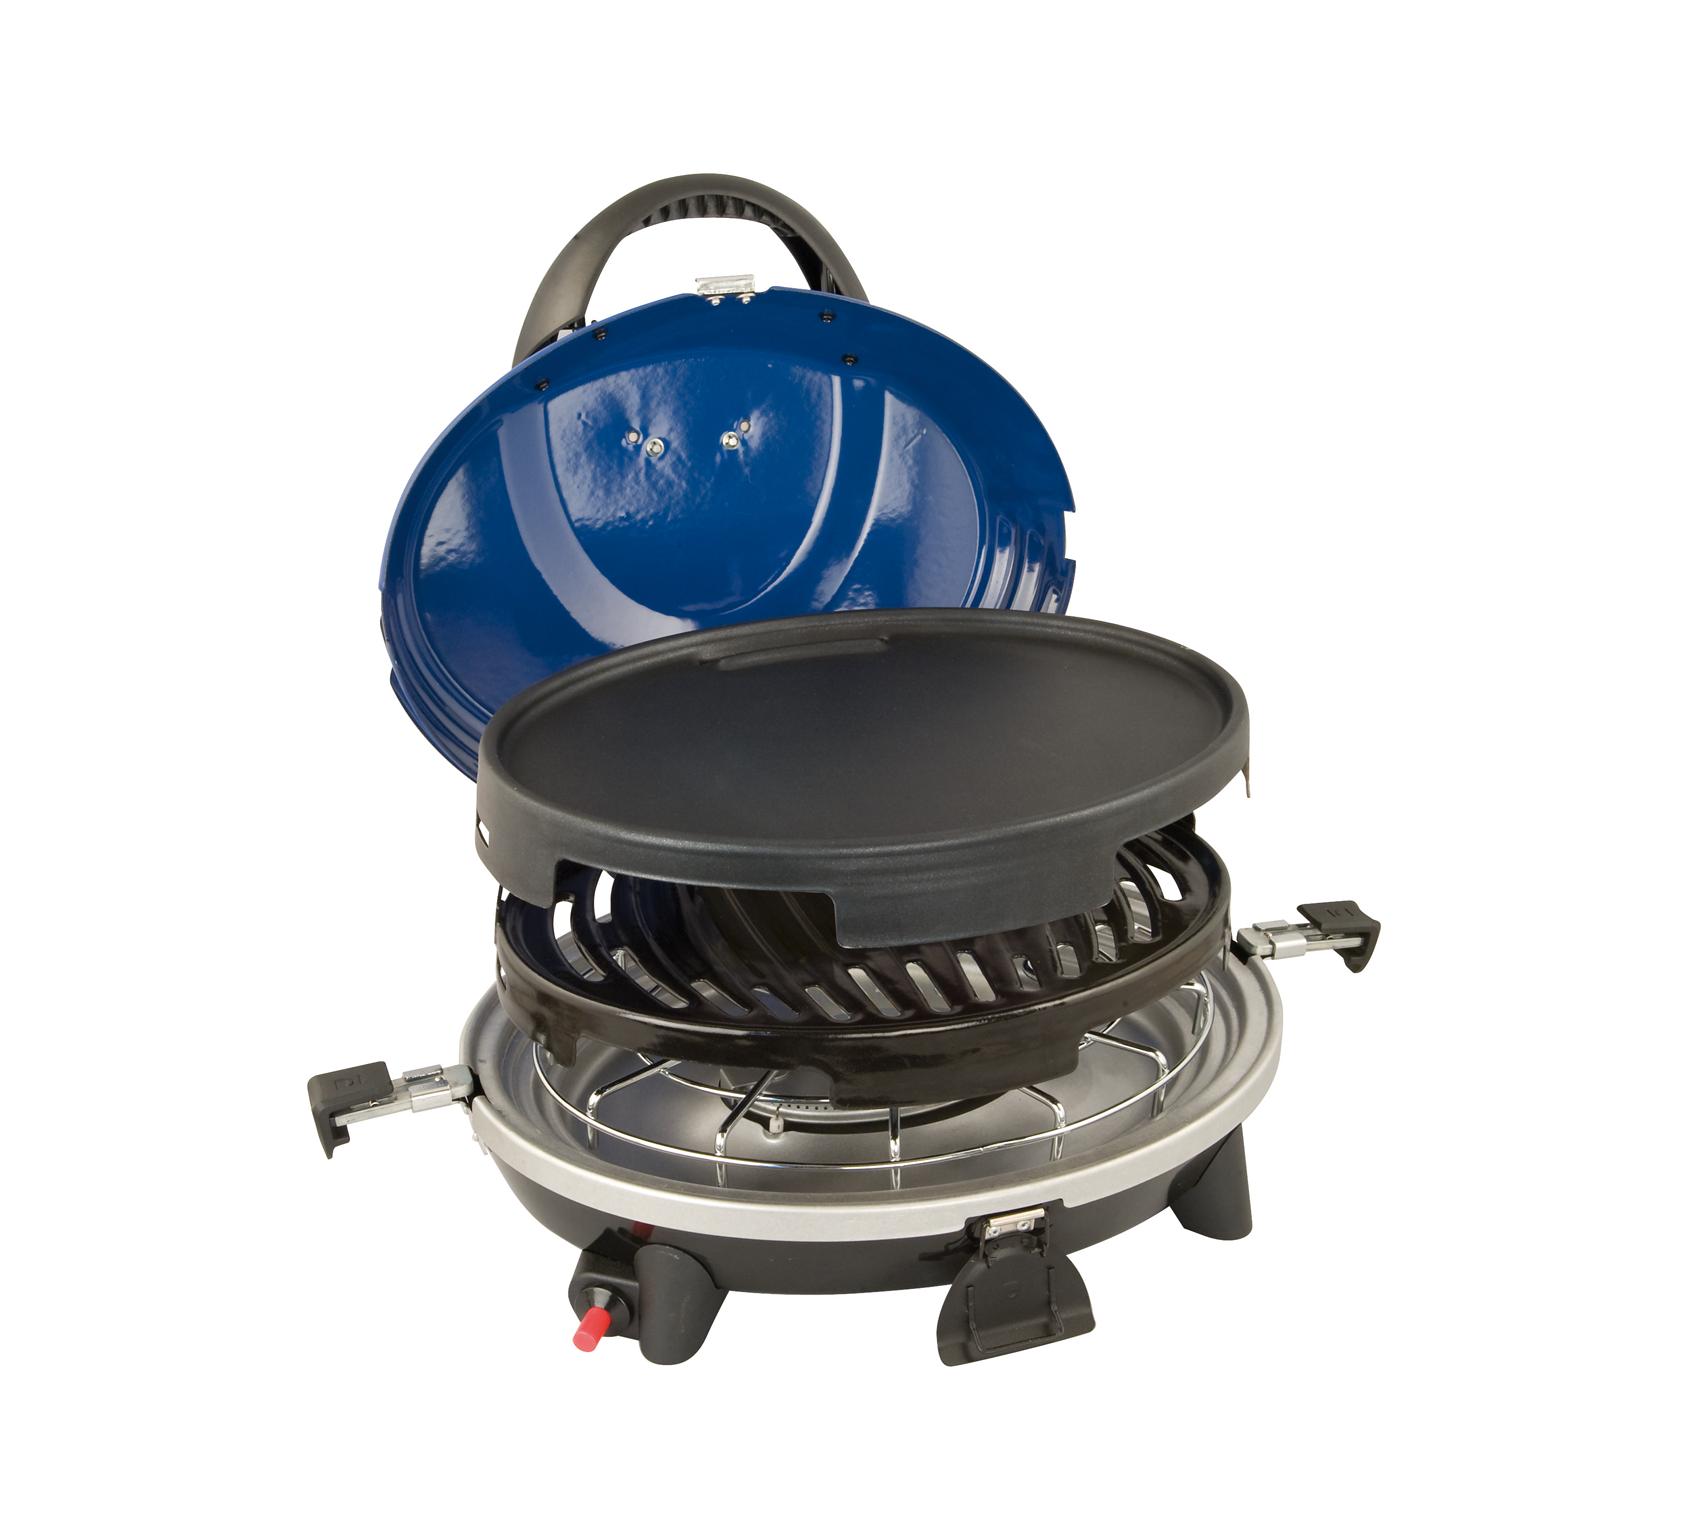 campingaz 3 in 1 grill stove cv g nstig kaufen gasgrill. Black Bedroom Furniture Sets. Home Design Ideas